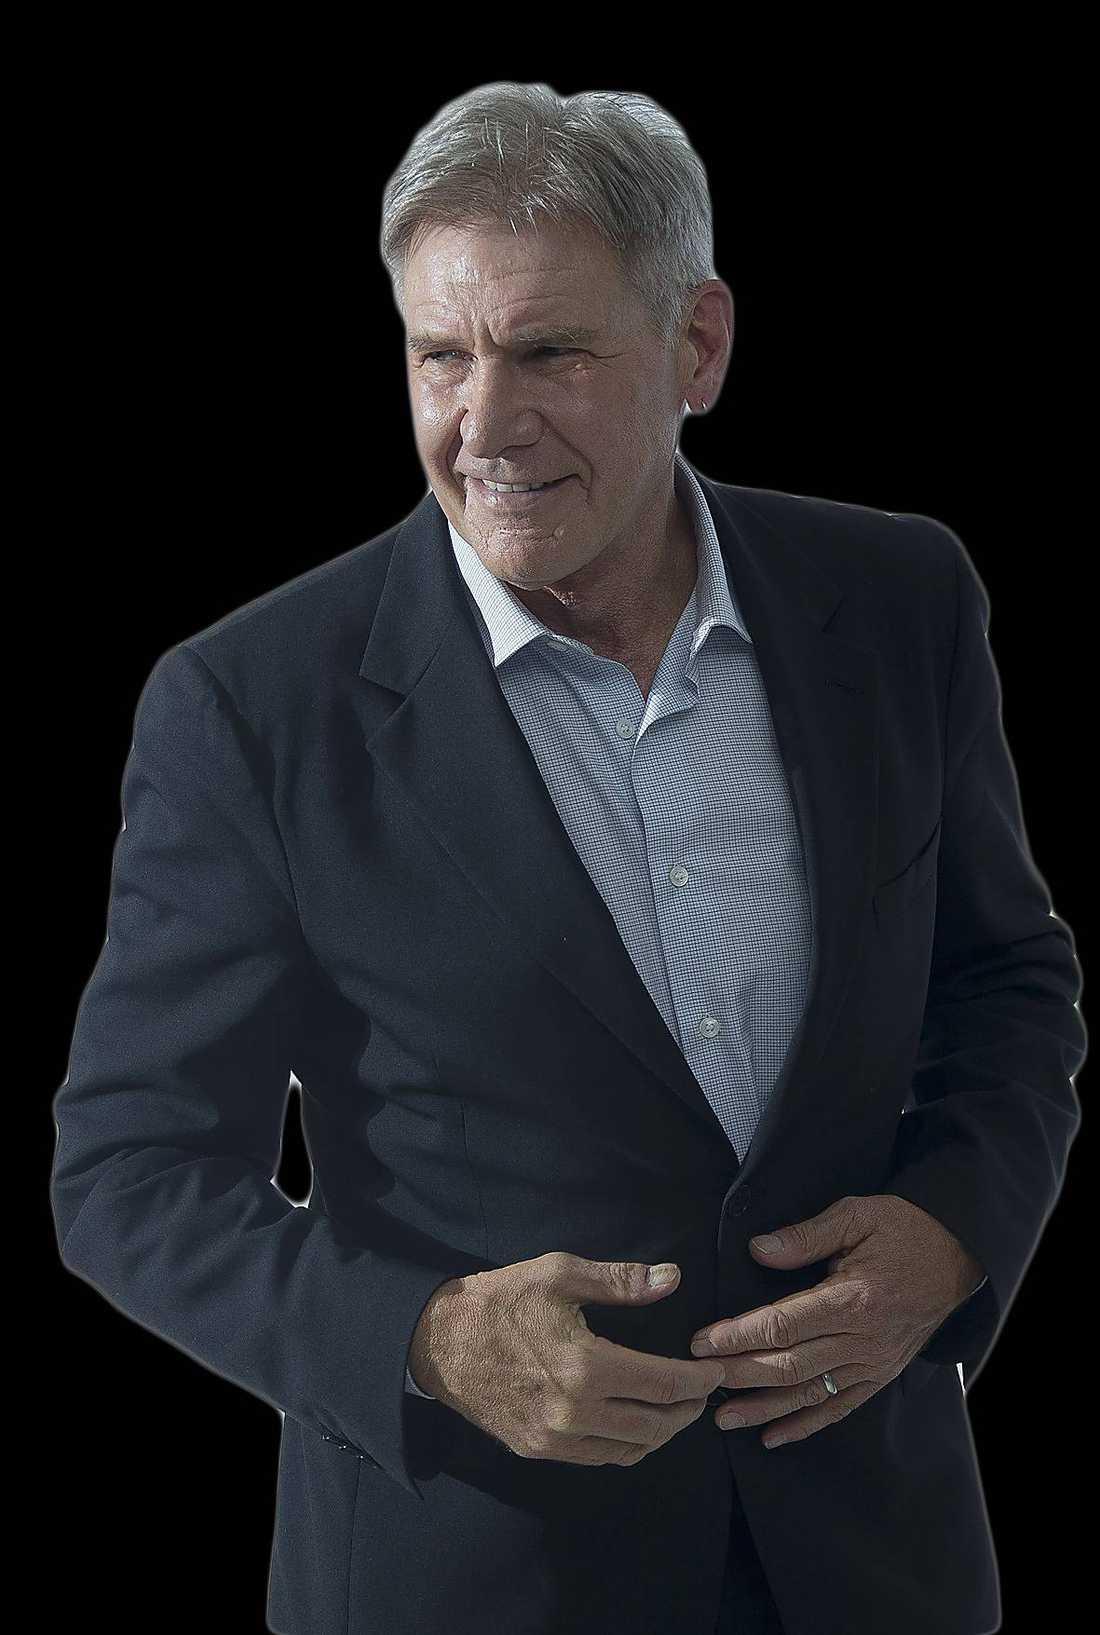 Harrison Ford, 72.